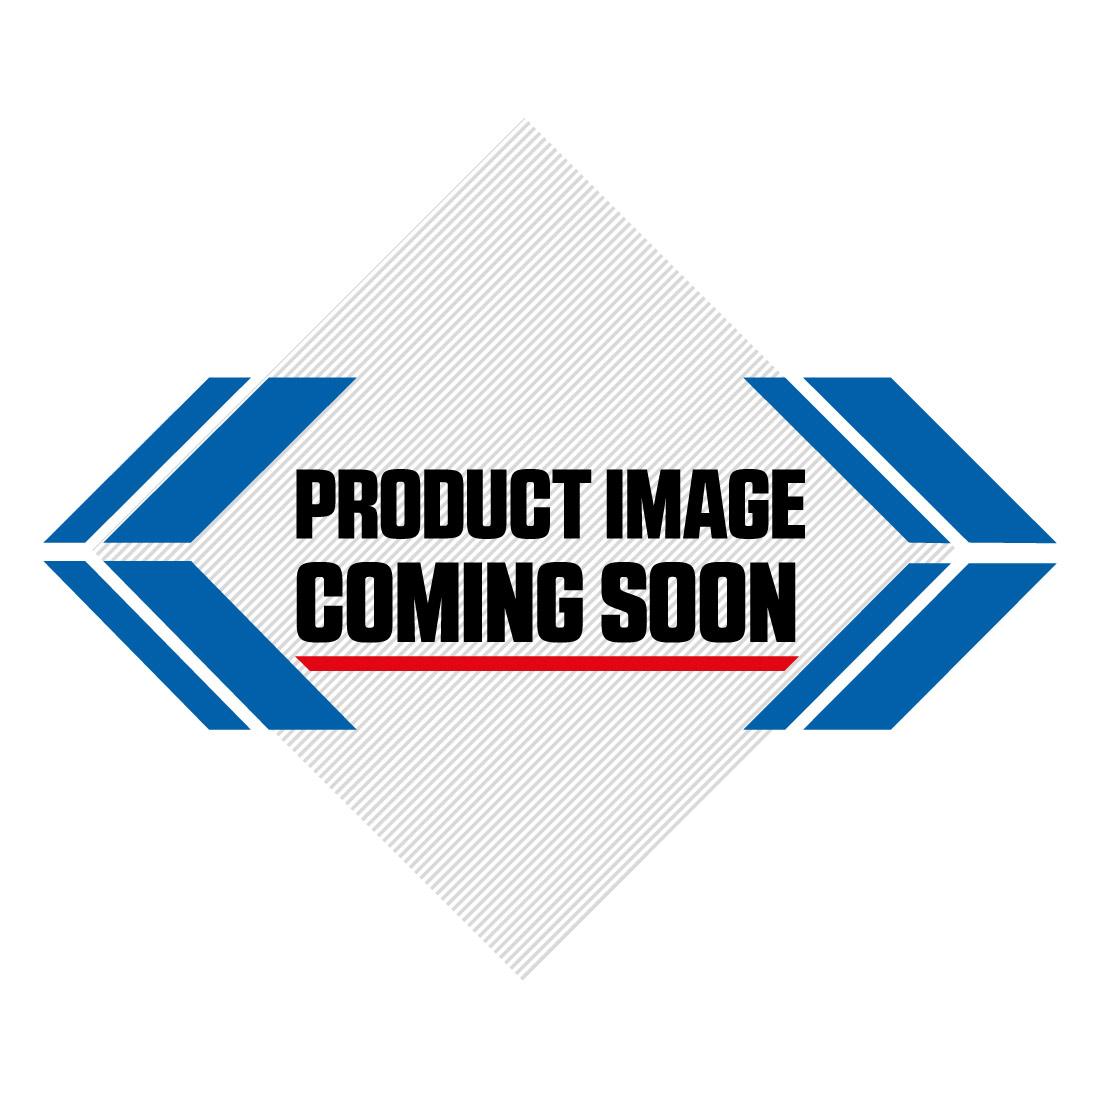 Honda Plastic Kit CRF 230 (08-14) OEM Factory Image-4>